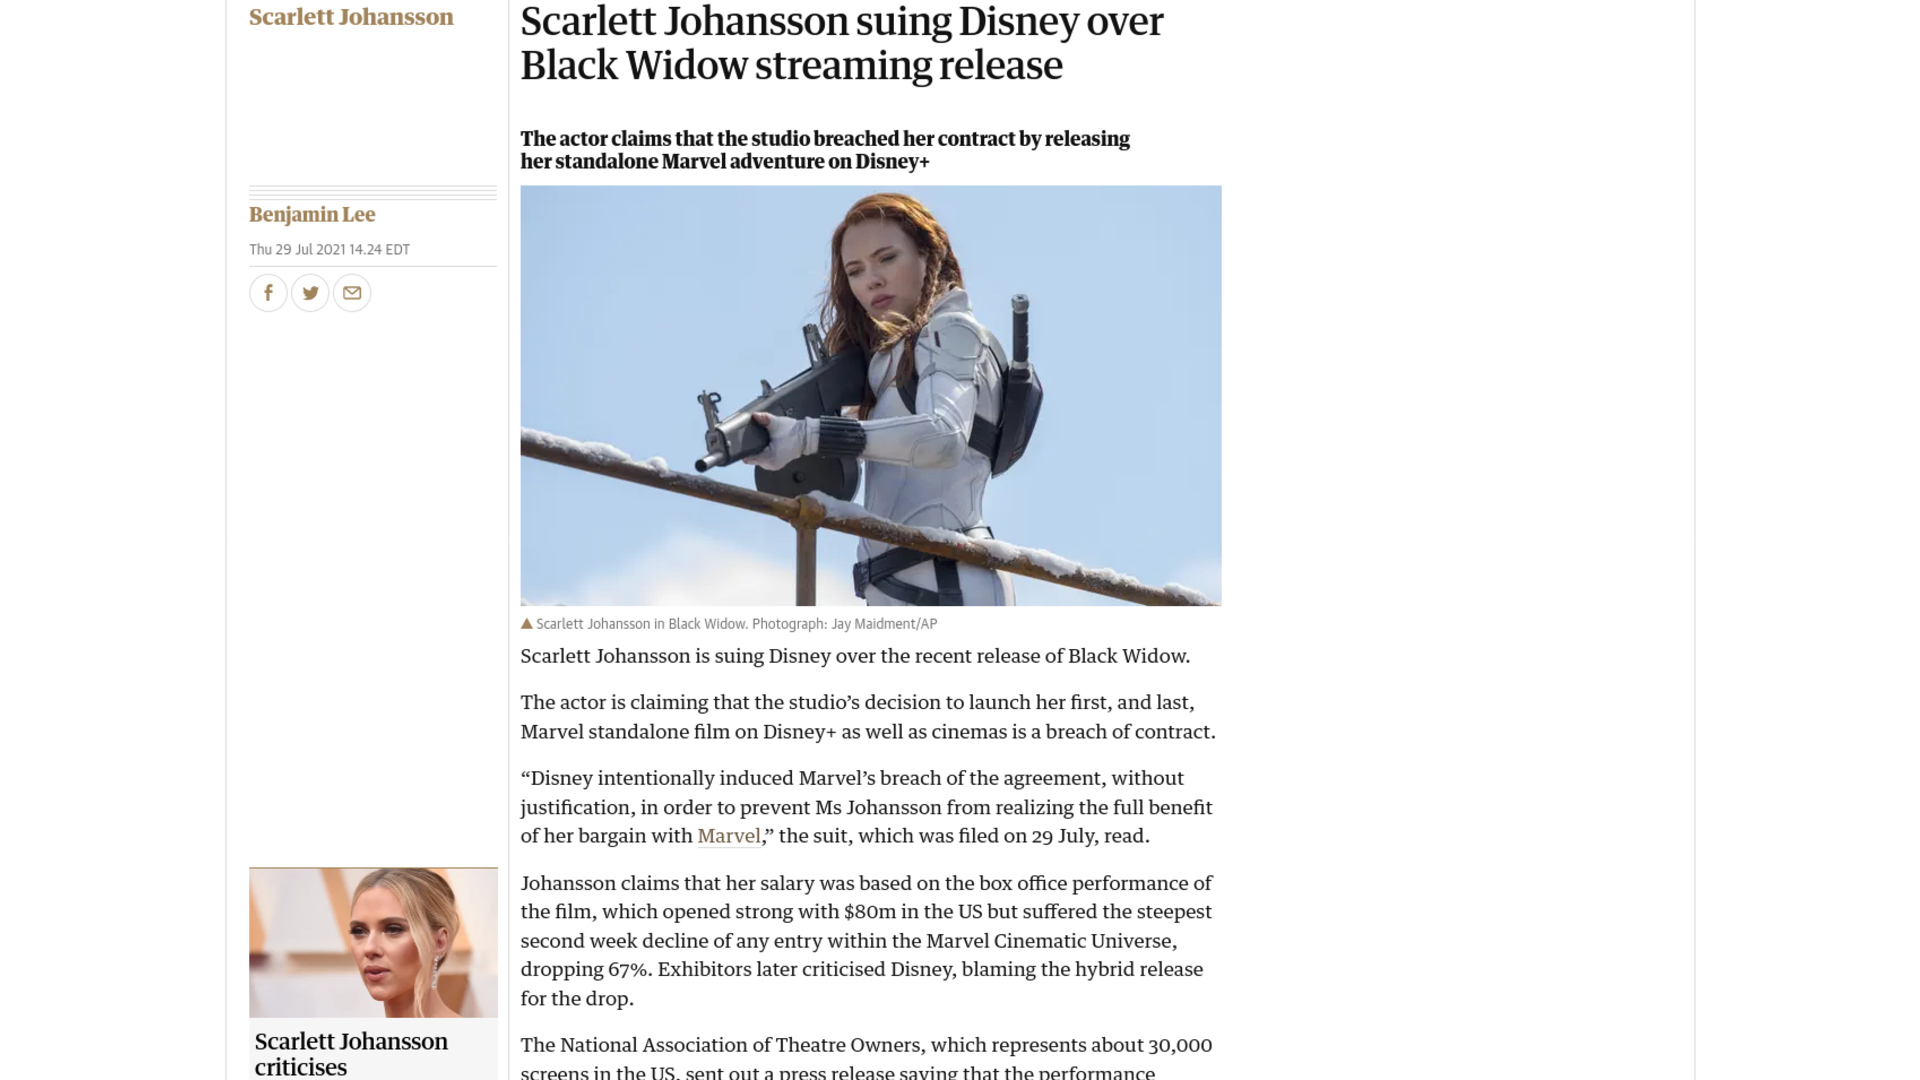 Fairness Rocks News Scarlett Johansson suing Disney over Black Widow streaming release